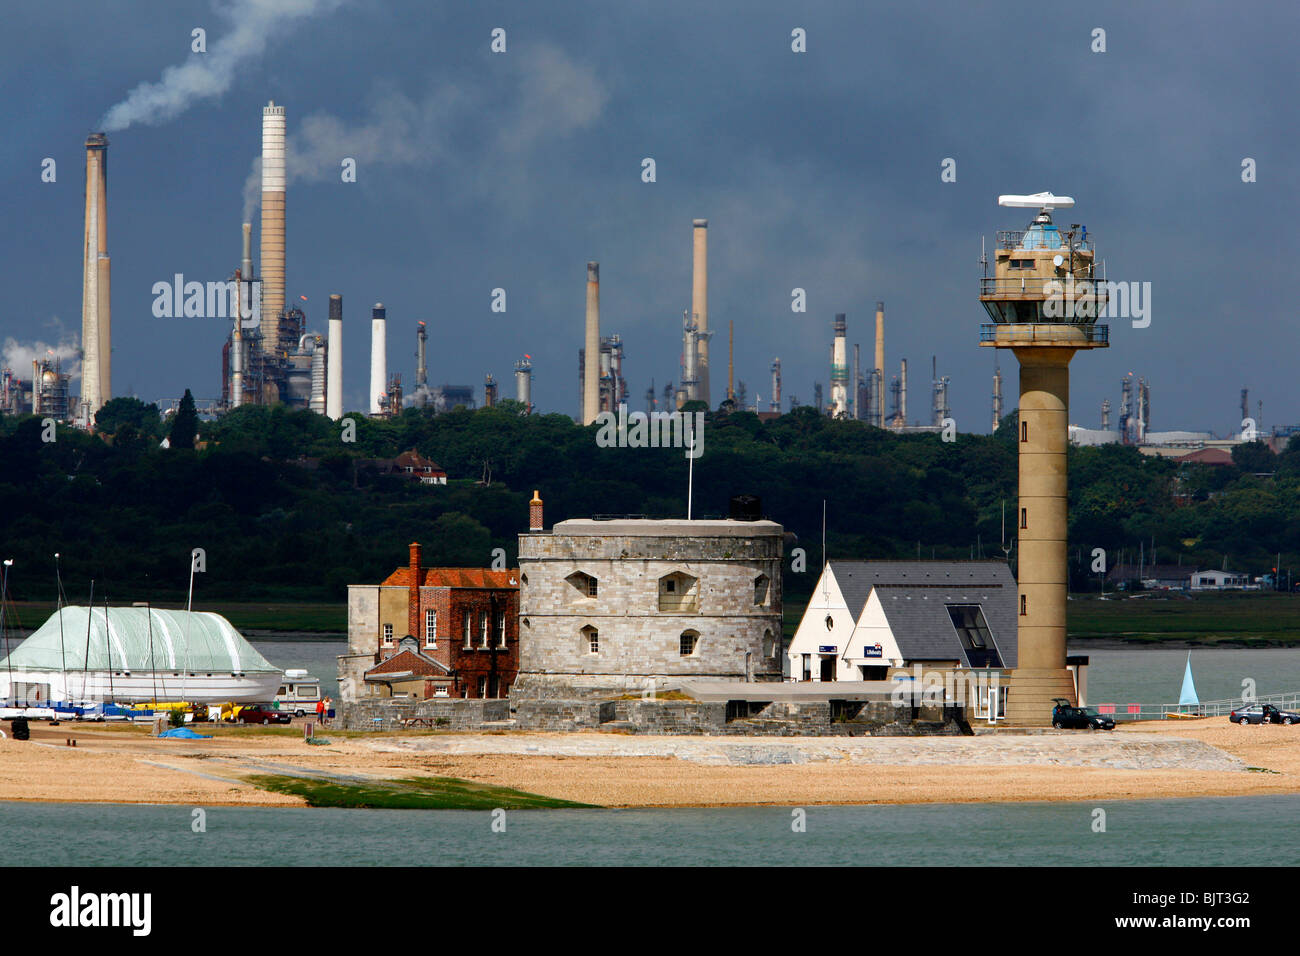 Calshot, Coastguard, Port, Radio, Control, Marine, Traffic, shipping, Control, Fawley oil Refinery, Southampton, - Stock Image